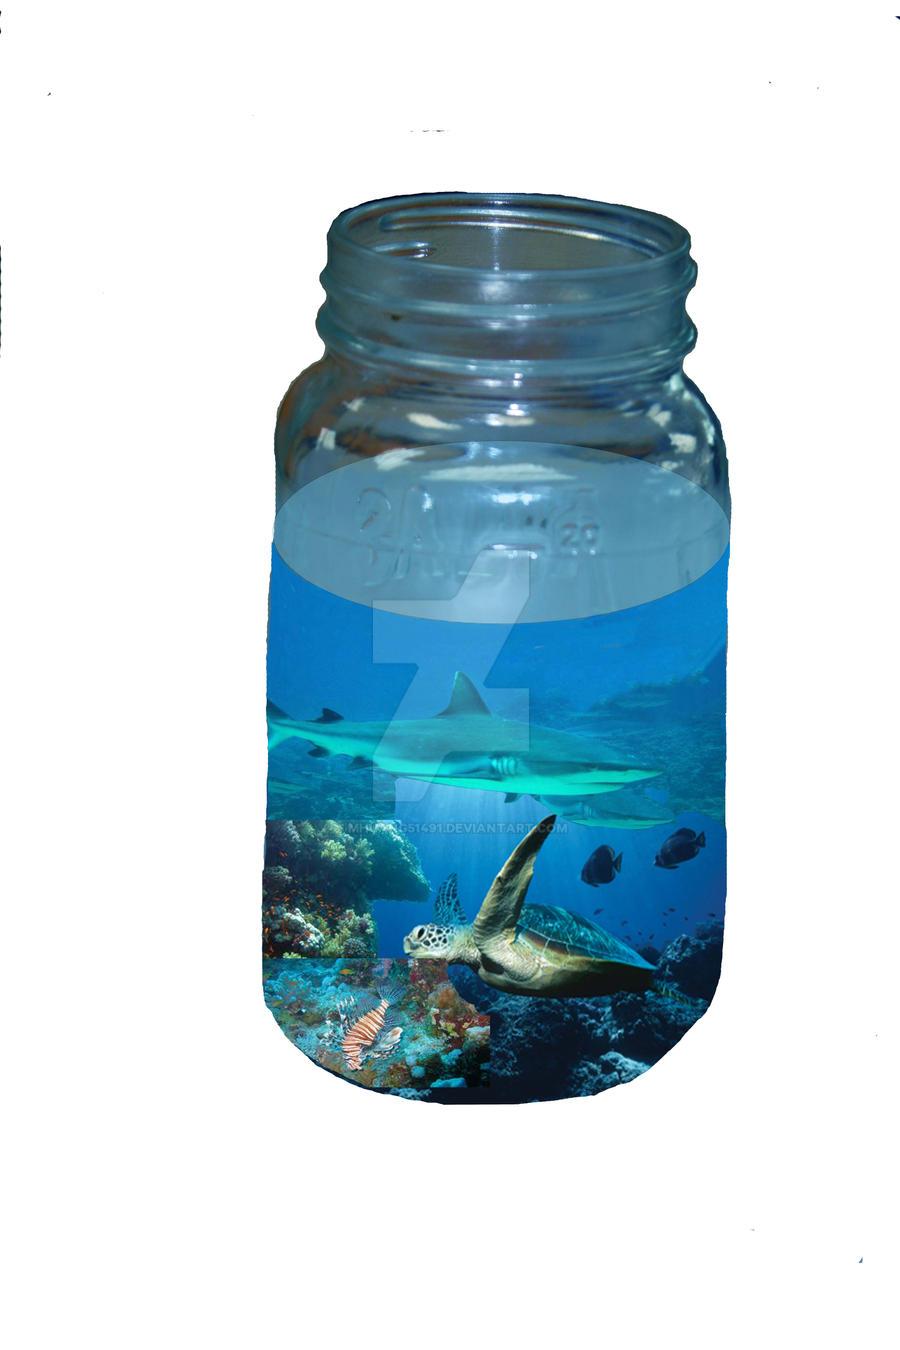 Aquarium in a Jar by MHuang51491